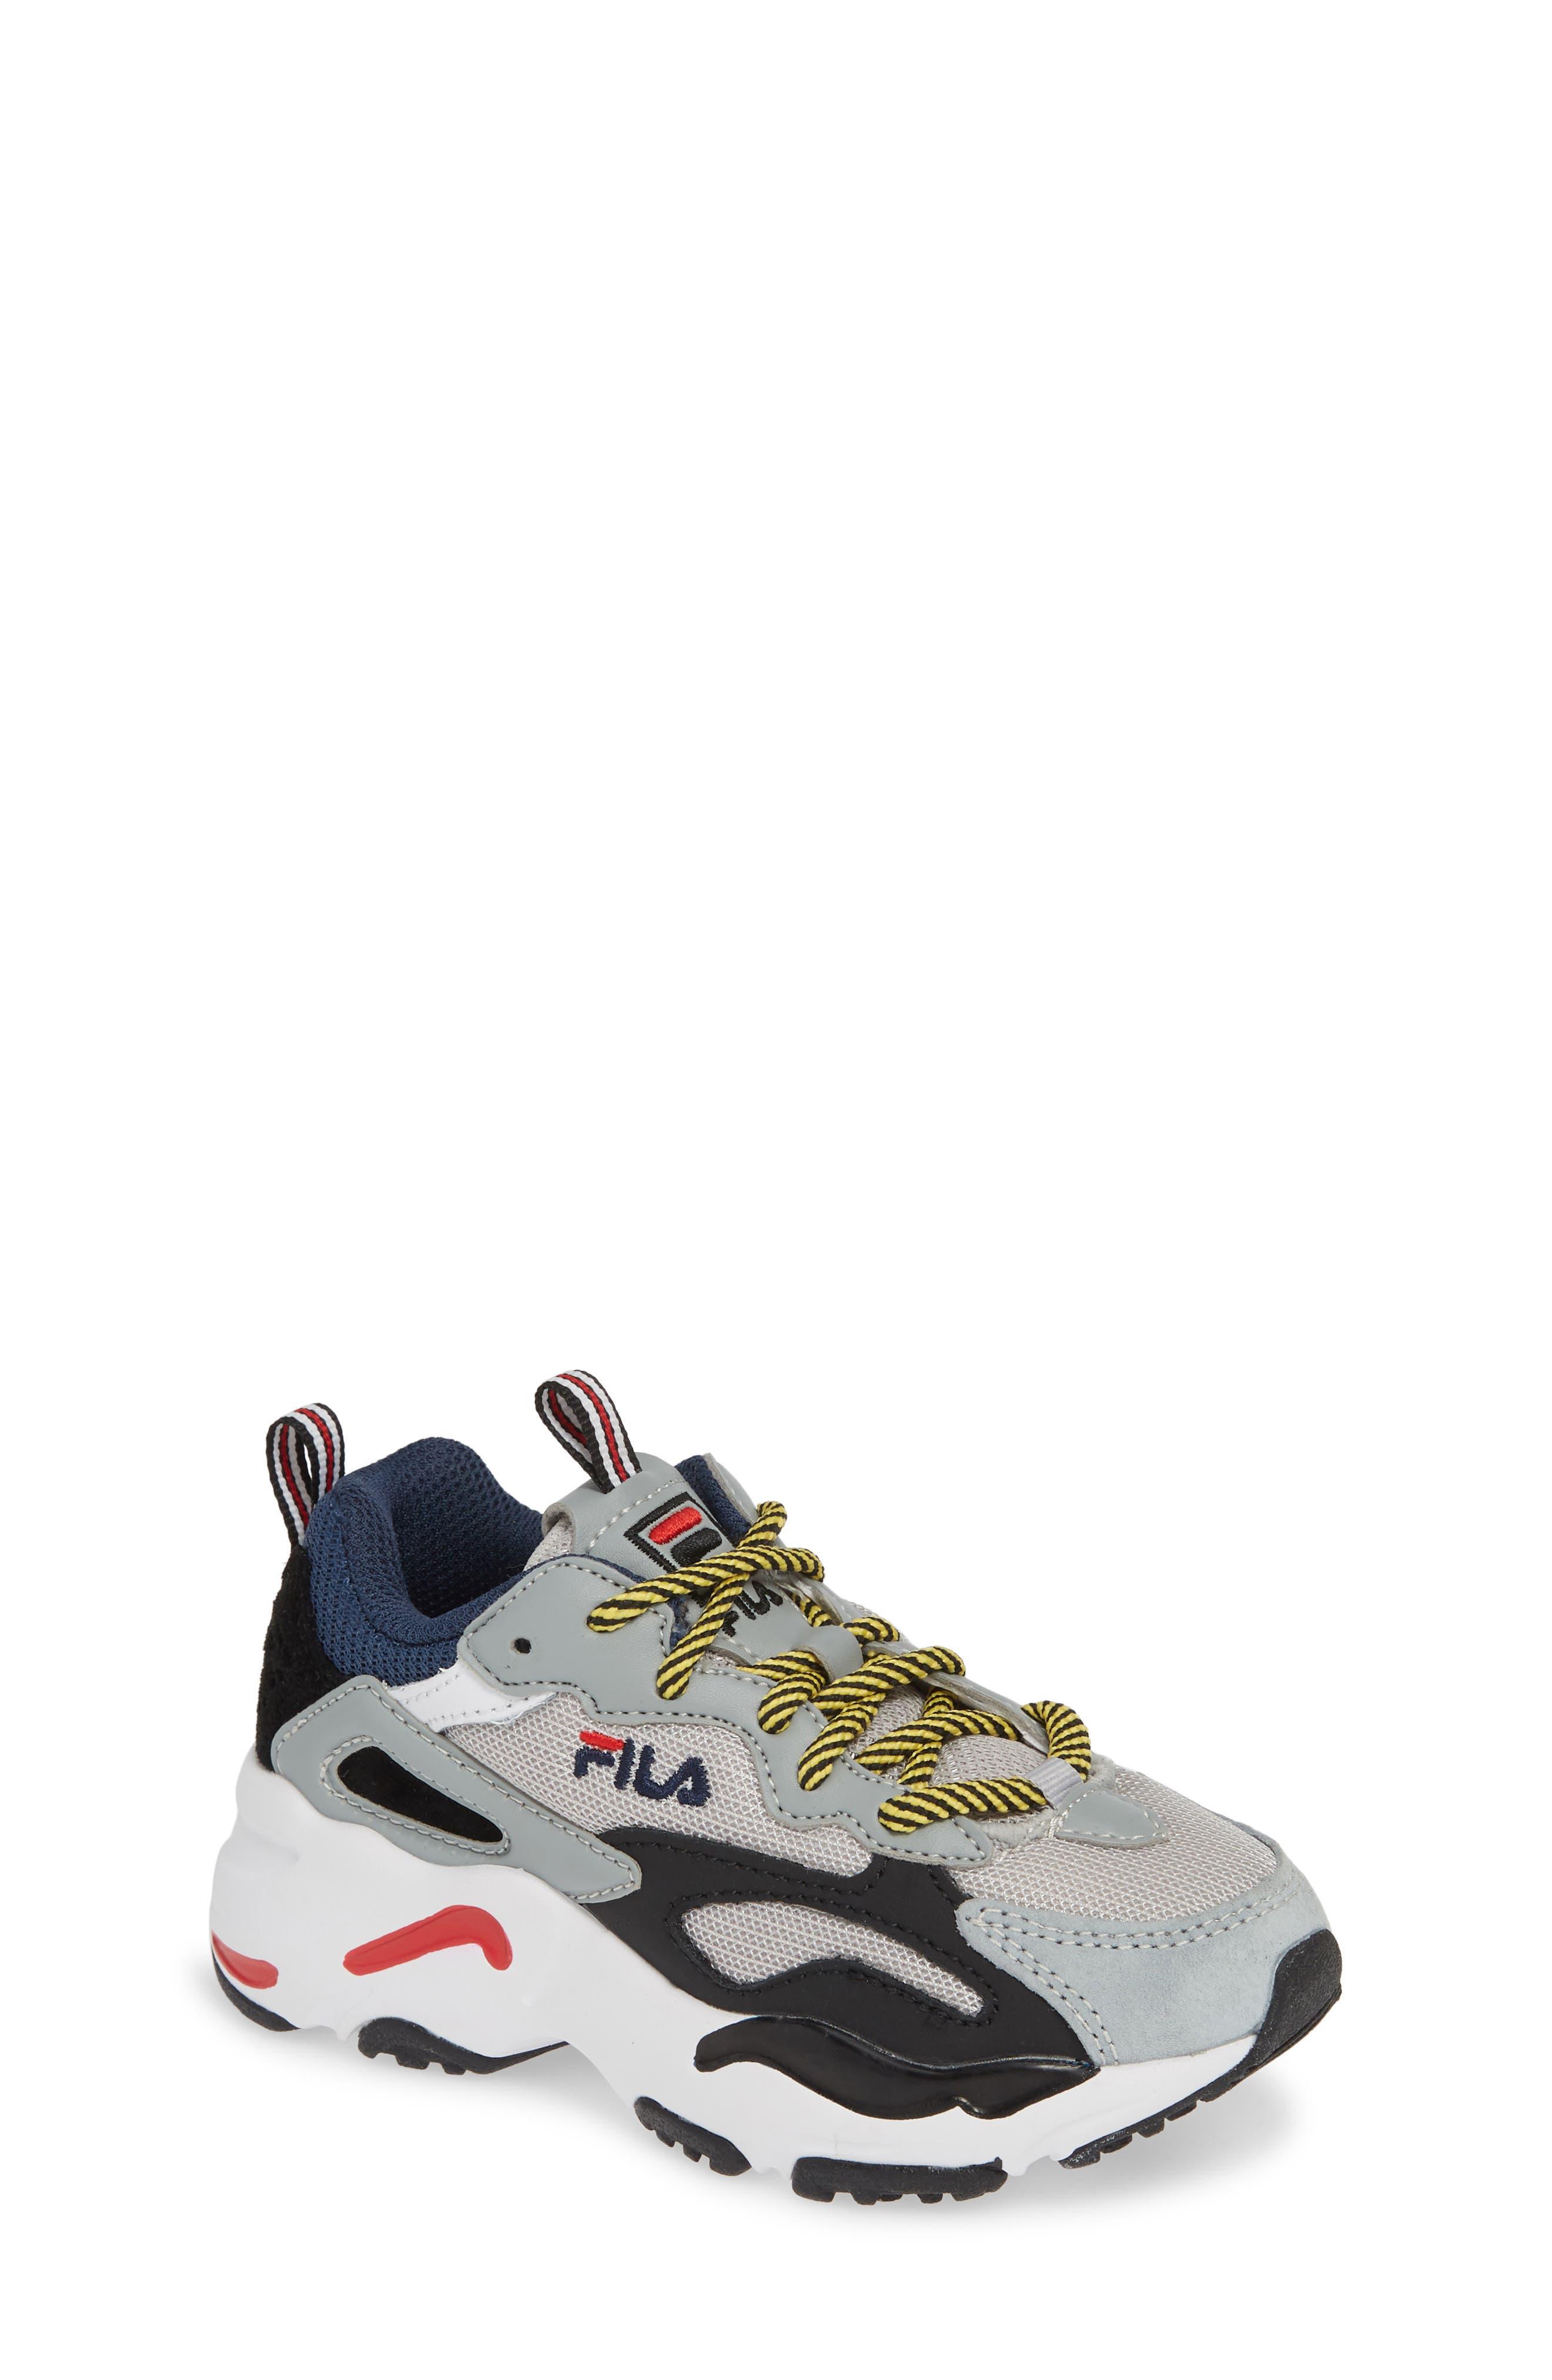 FILA Ray Tracer Sneaker, Main, color, VAPOR BLUE/ HIGHRISE/ BLACK